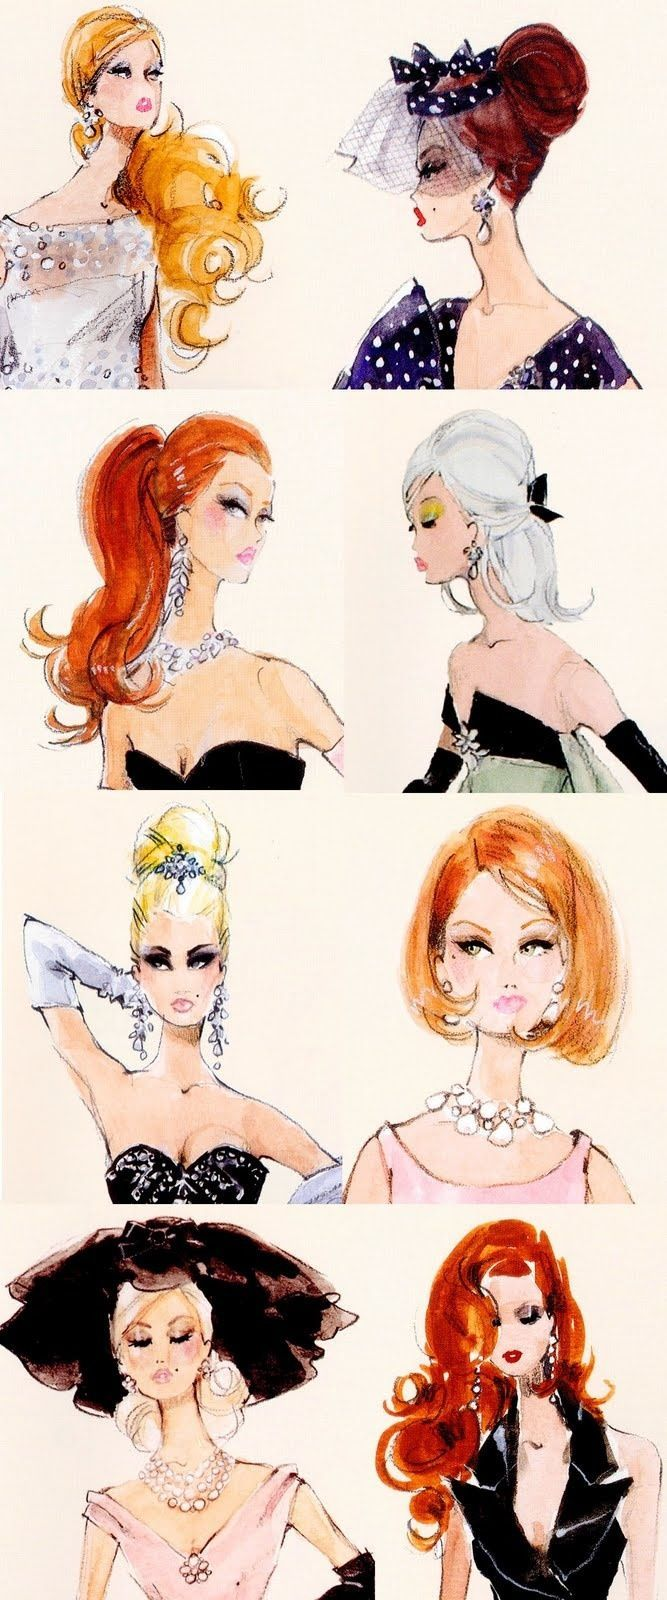 Retro hairstyle and retro makeup